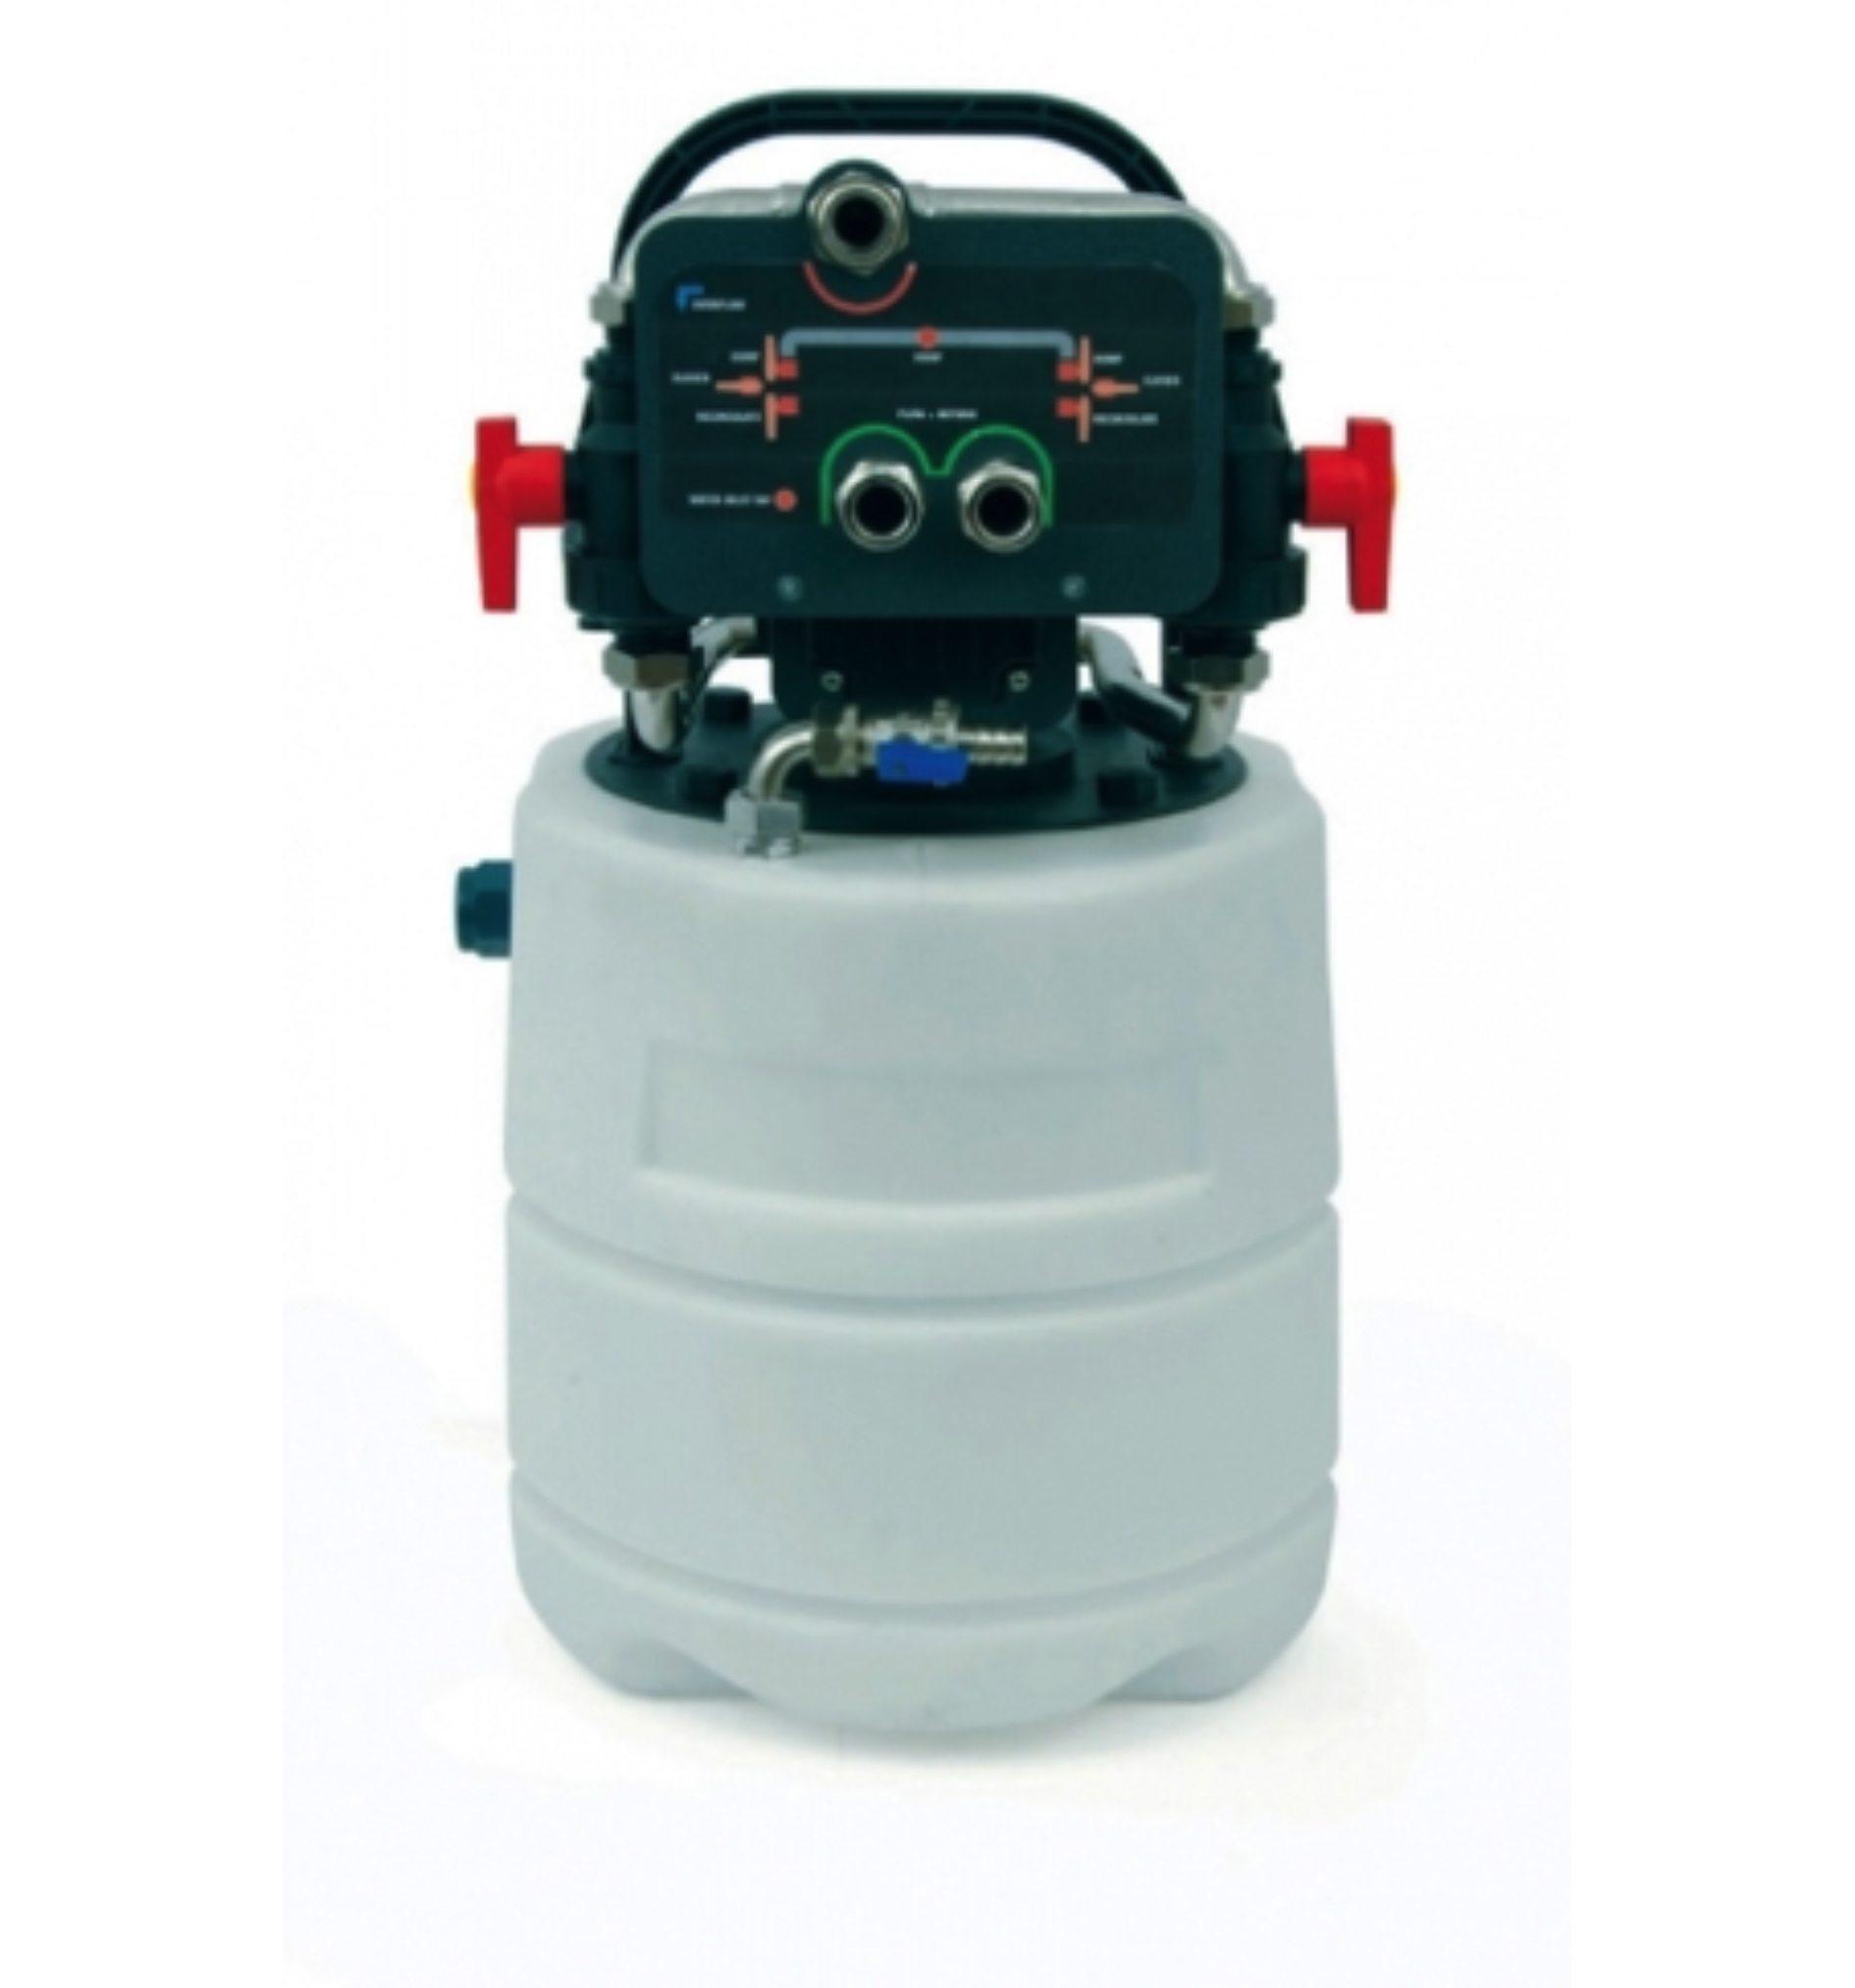 Power Flush Machine - The Leak Team